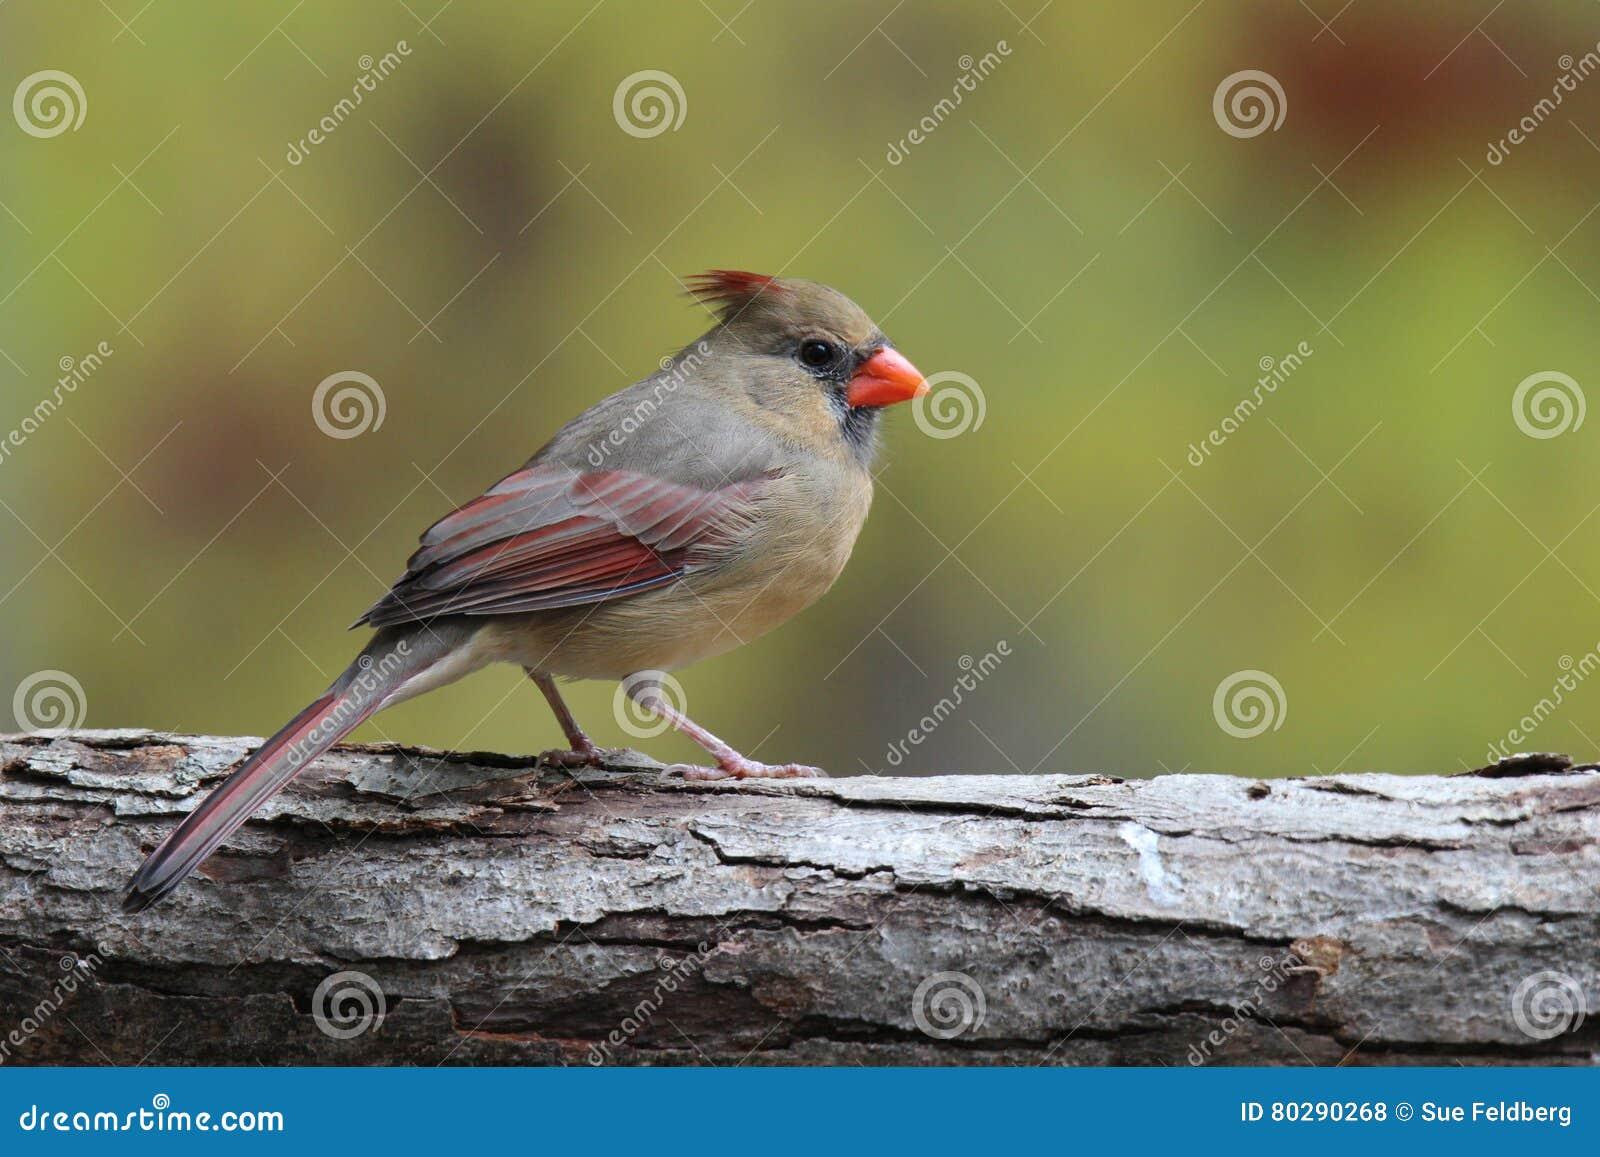 Female Cardinal in Fall